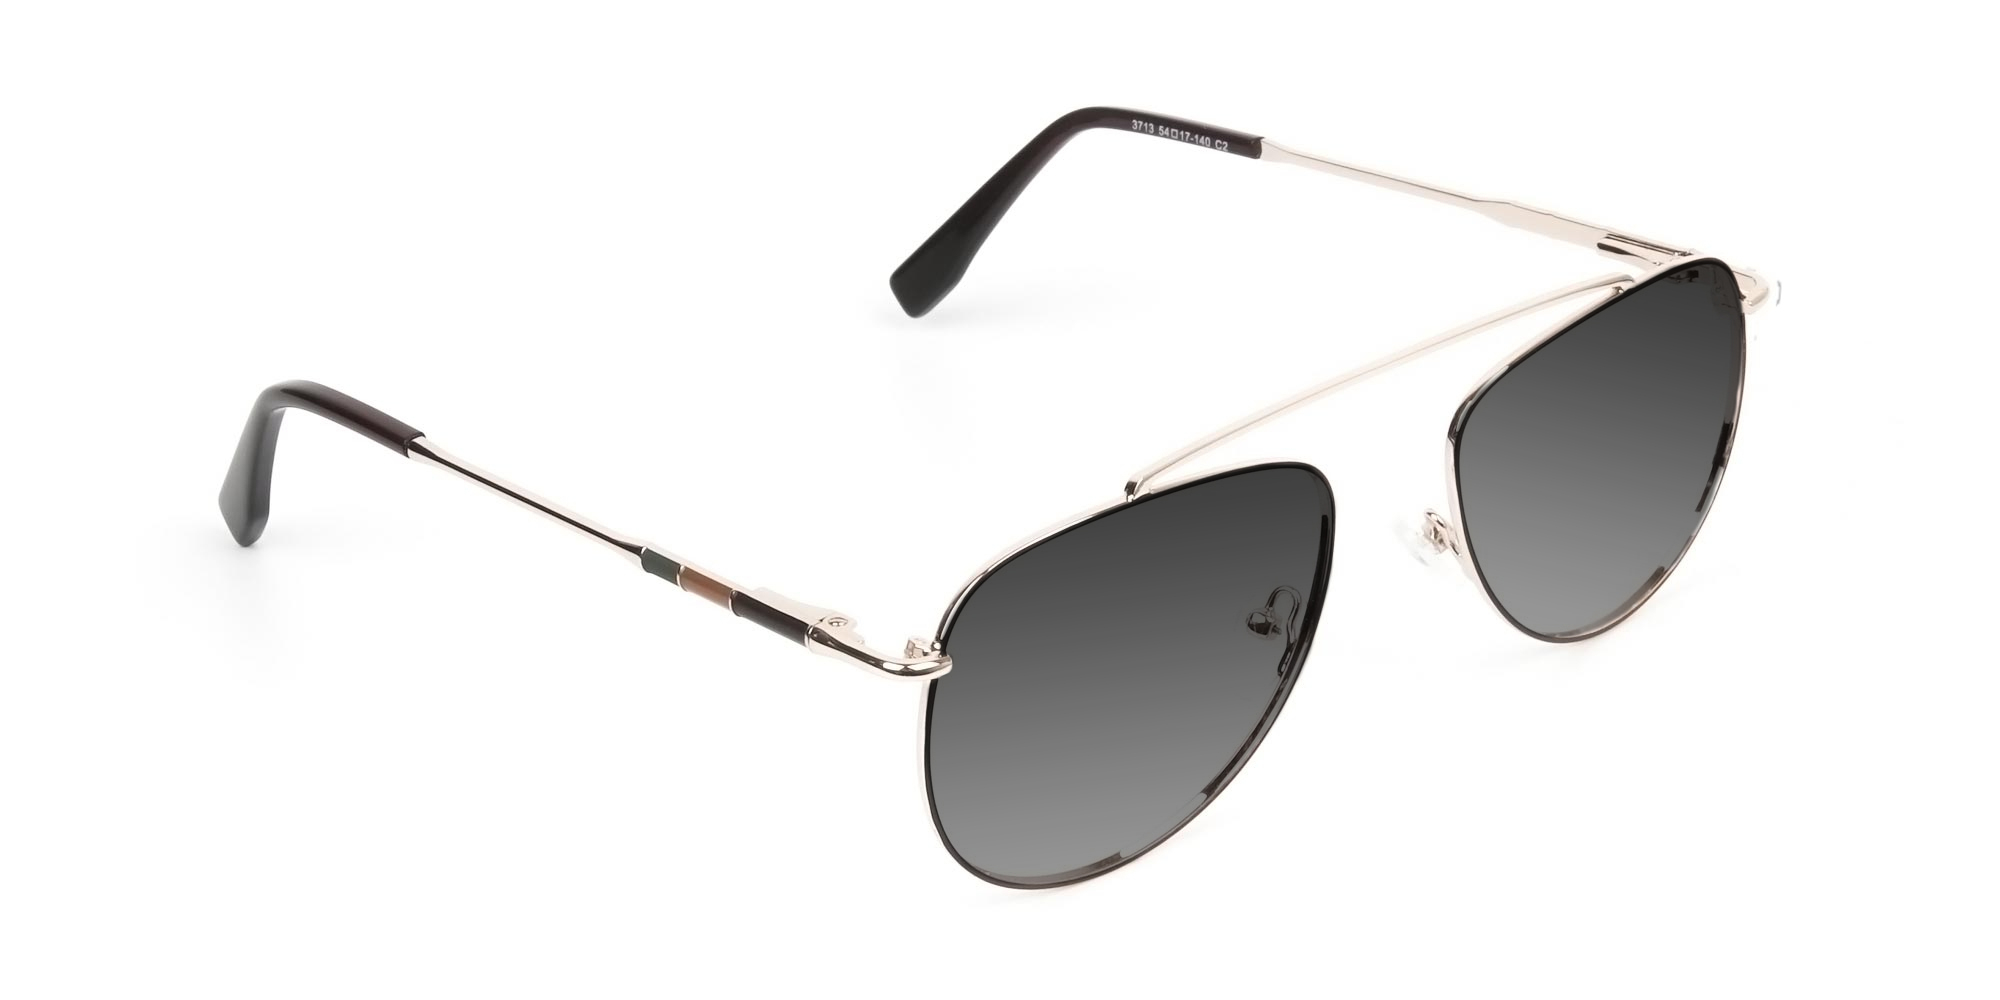 gold-brown-metal-aviator-grey-tinted-sunglasses